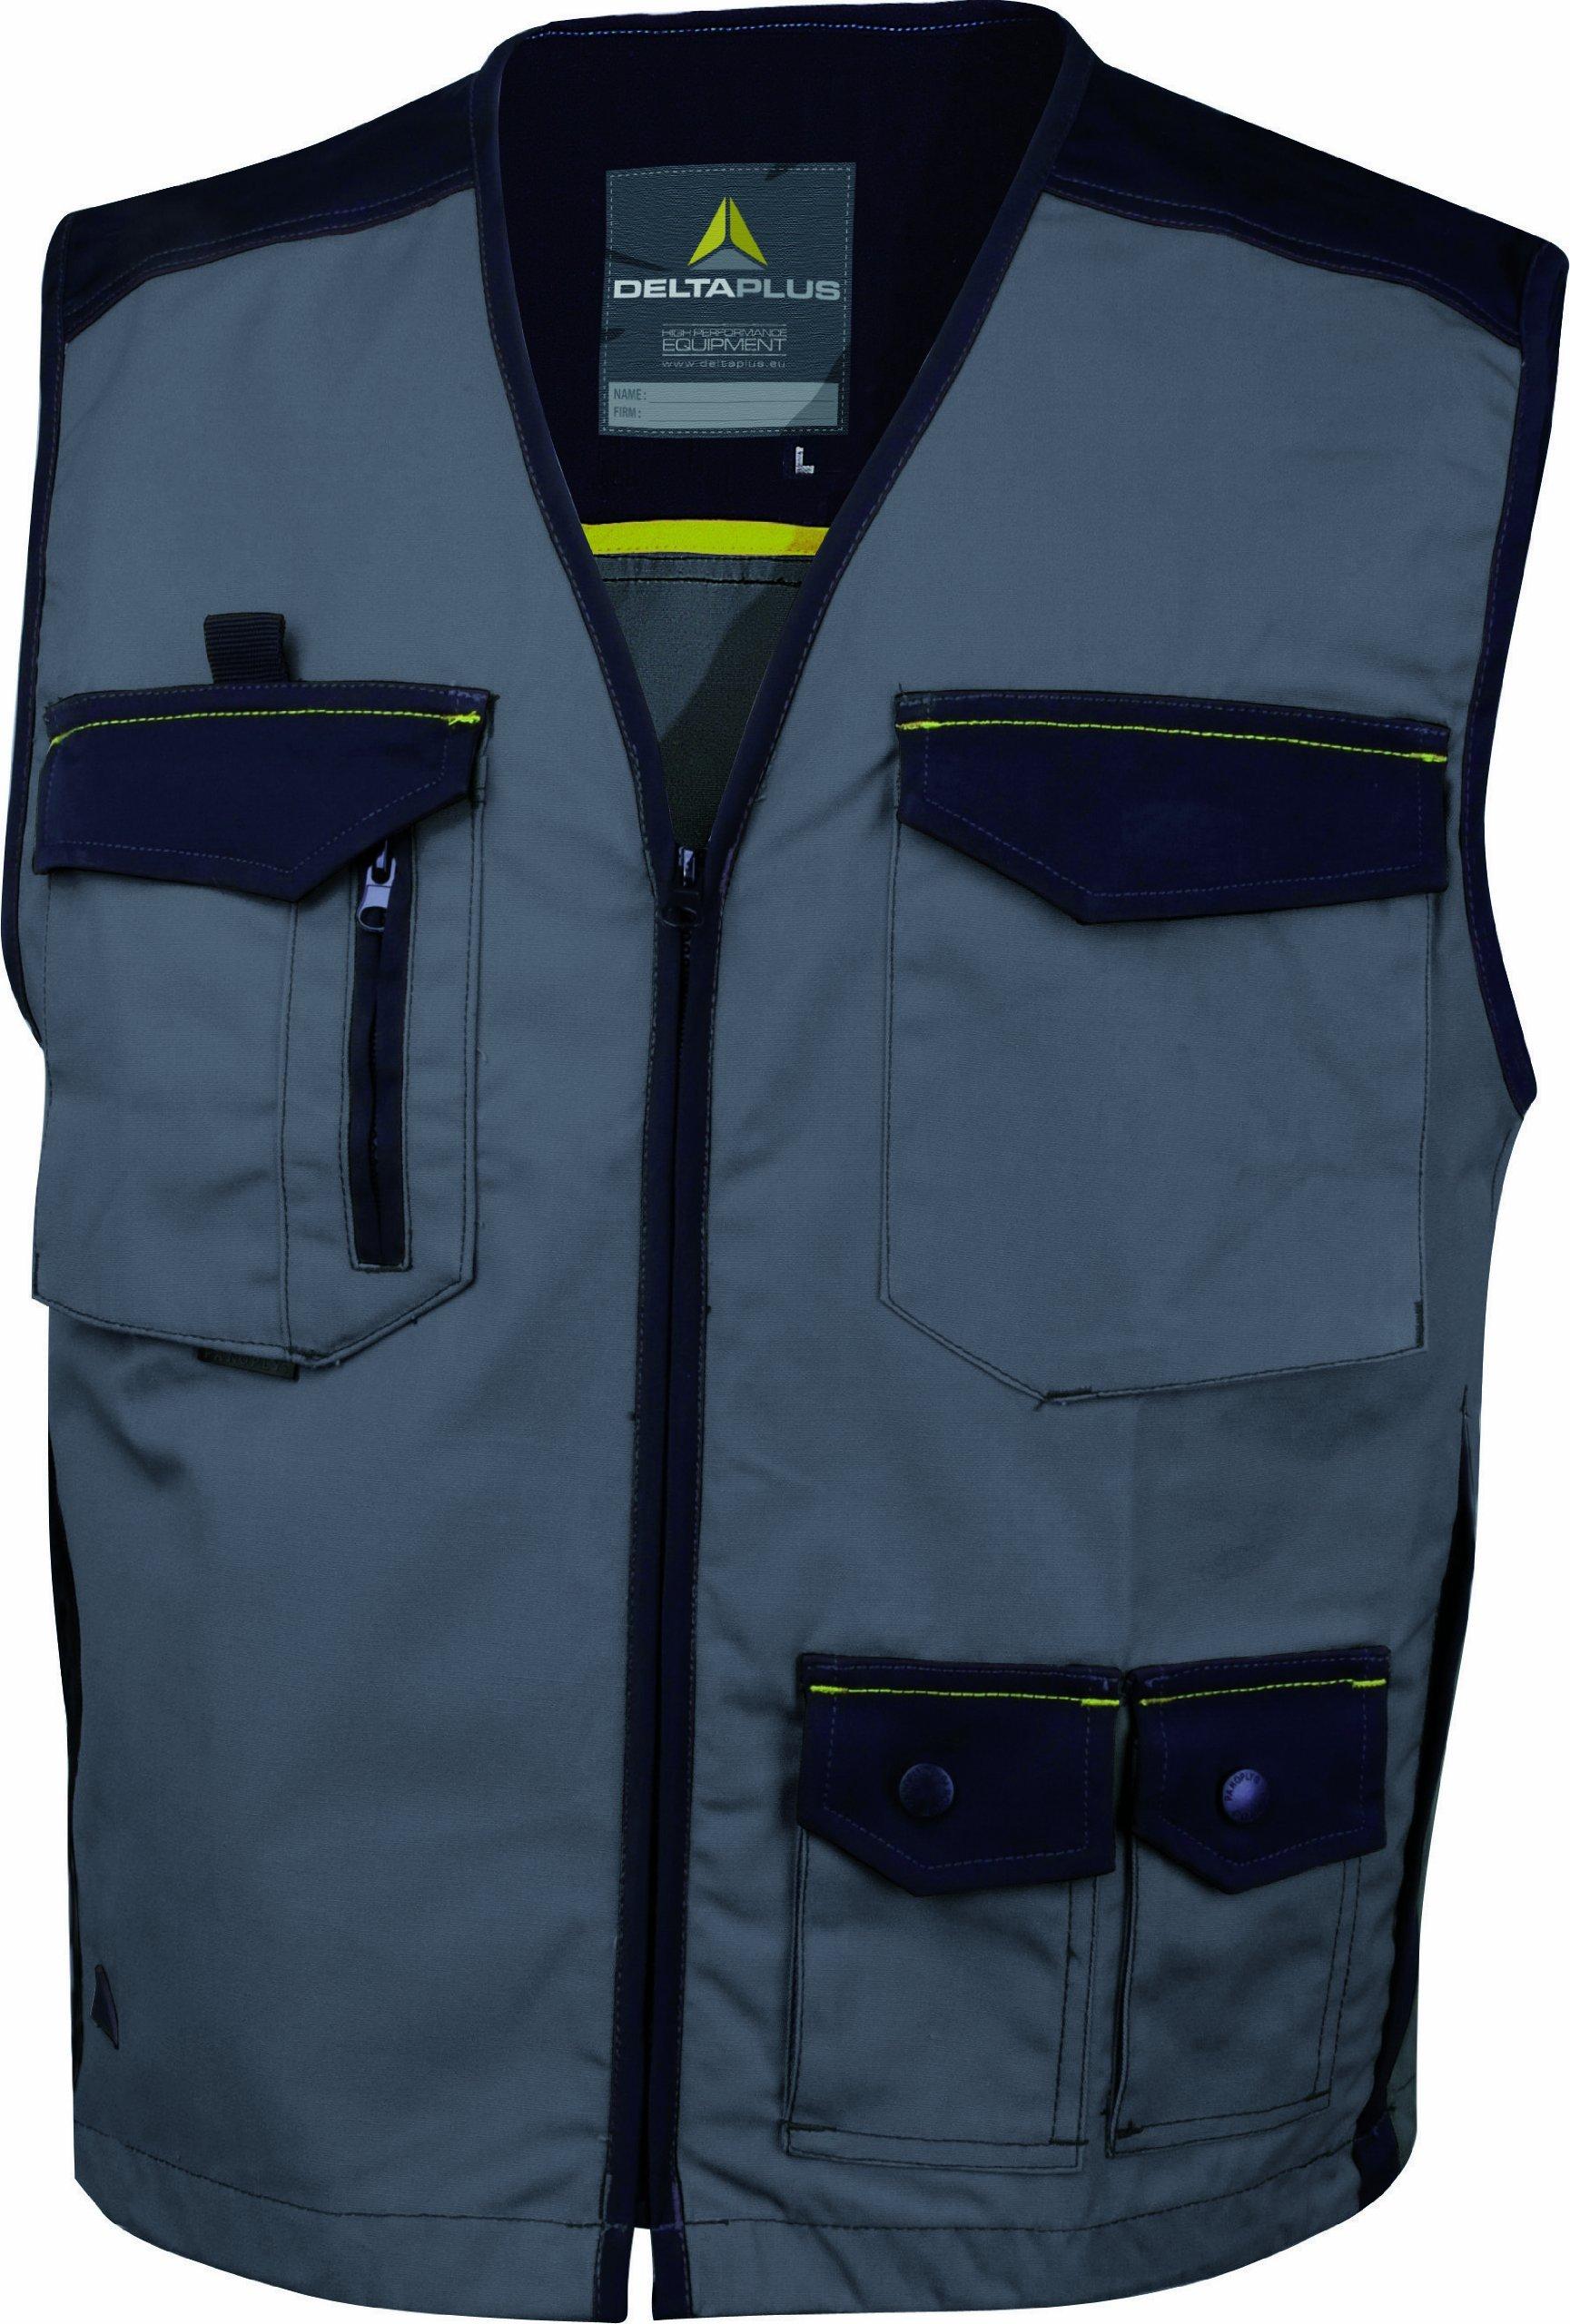 Panoply Men's Mach5 Spirit Lightweight Work Gilet Vest Jacket Bodywarmer Large/41-43 Grey/Black